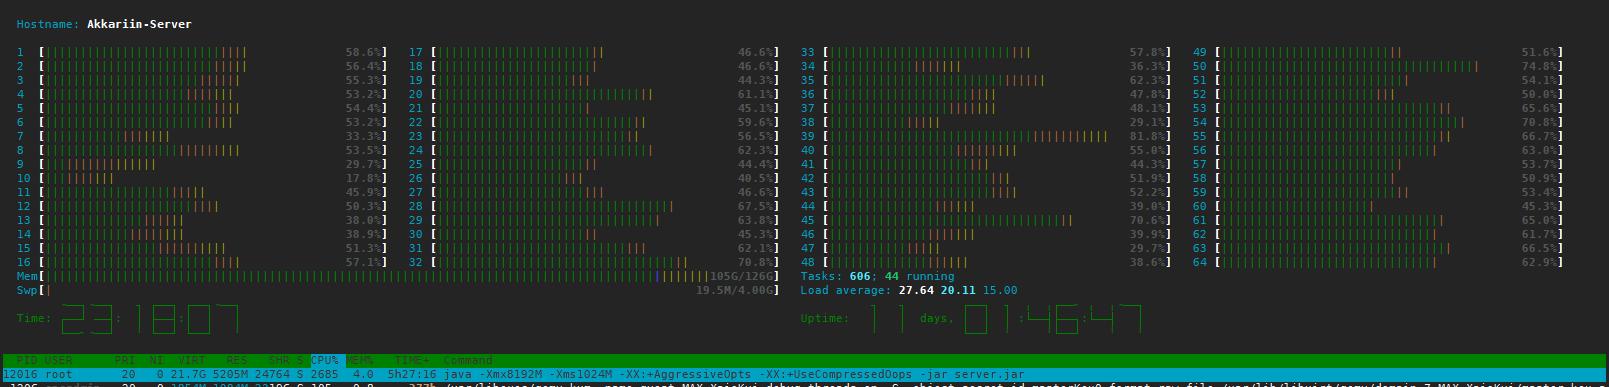 CPU 几乎所有核心都用上了